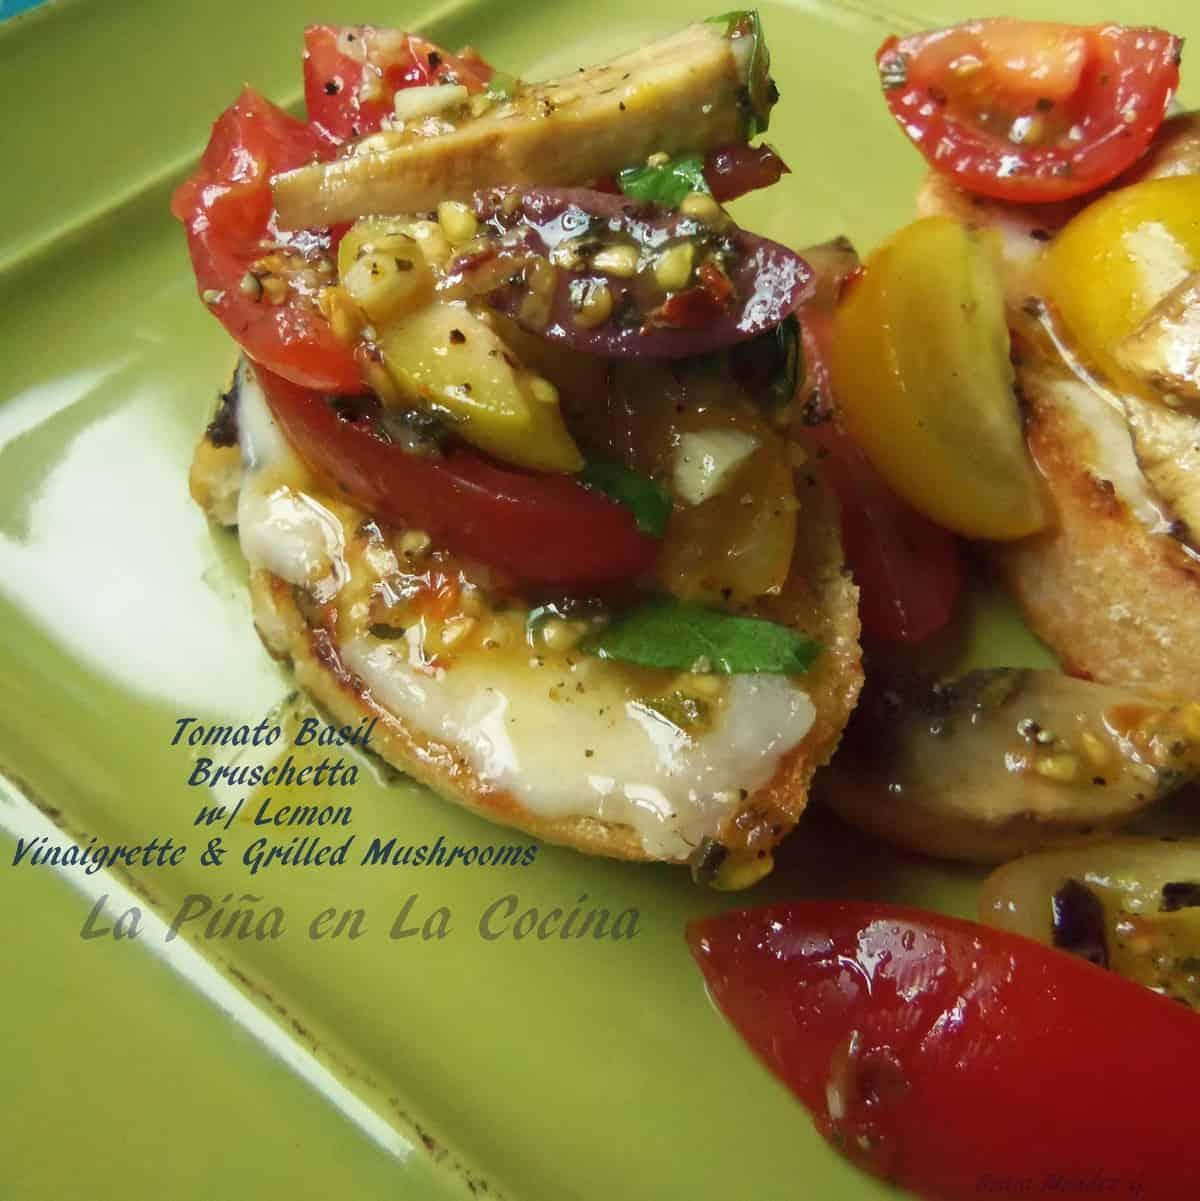 Melted Mozzarella on Crostini with Tomato Basil Bruschetta, Lemon Vinaigrette & Grilled Mushrooms